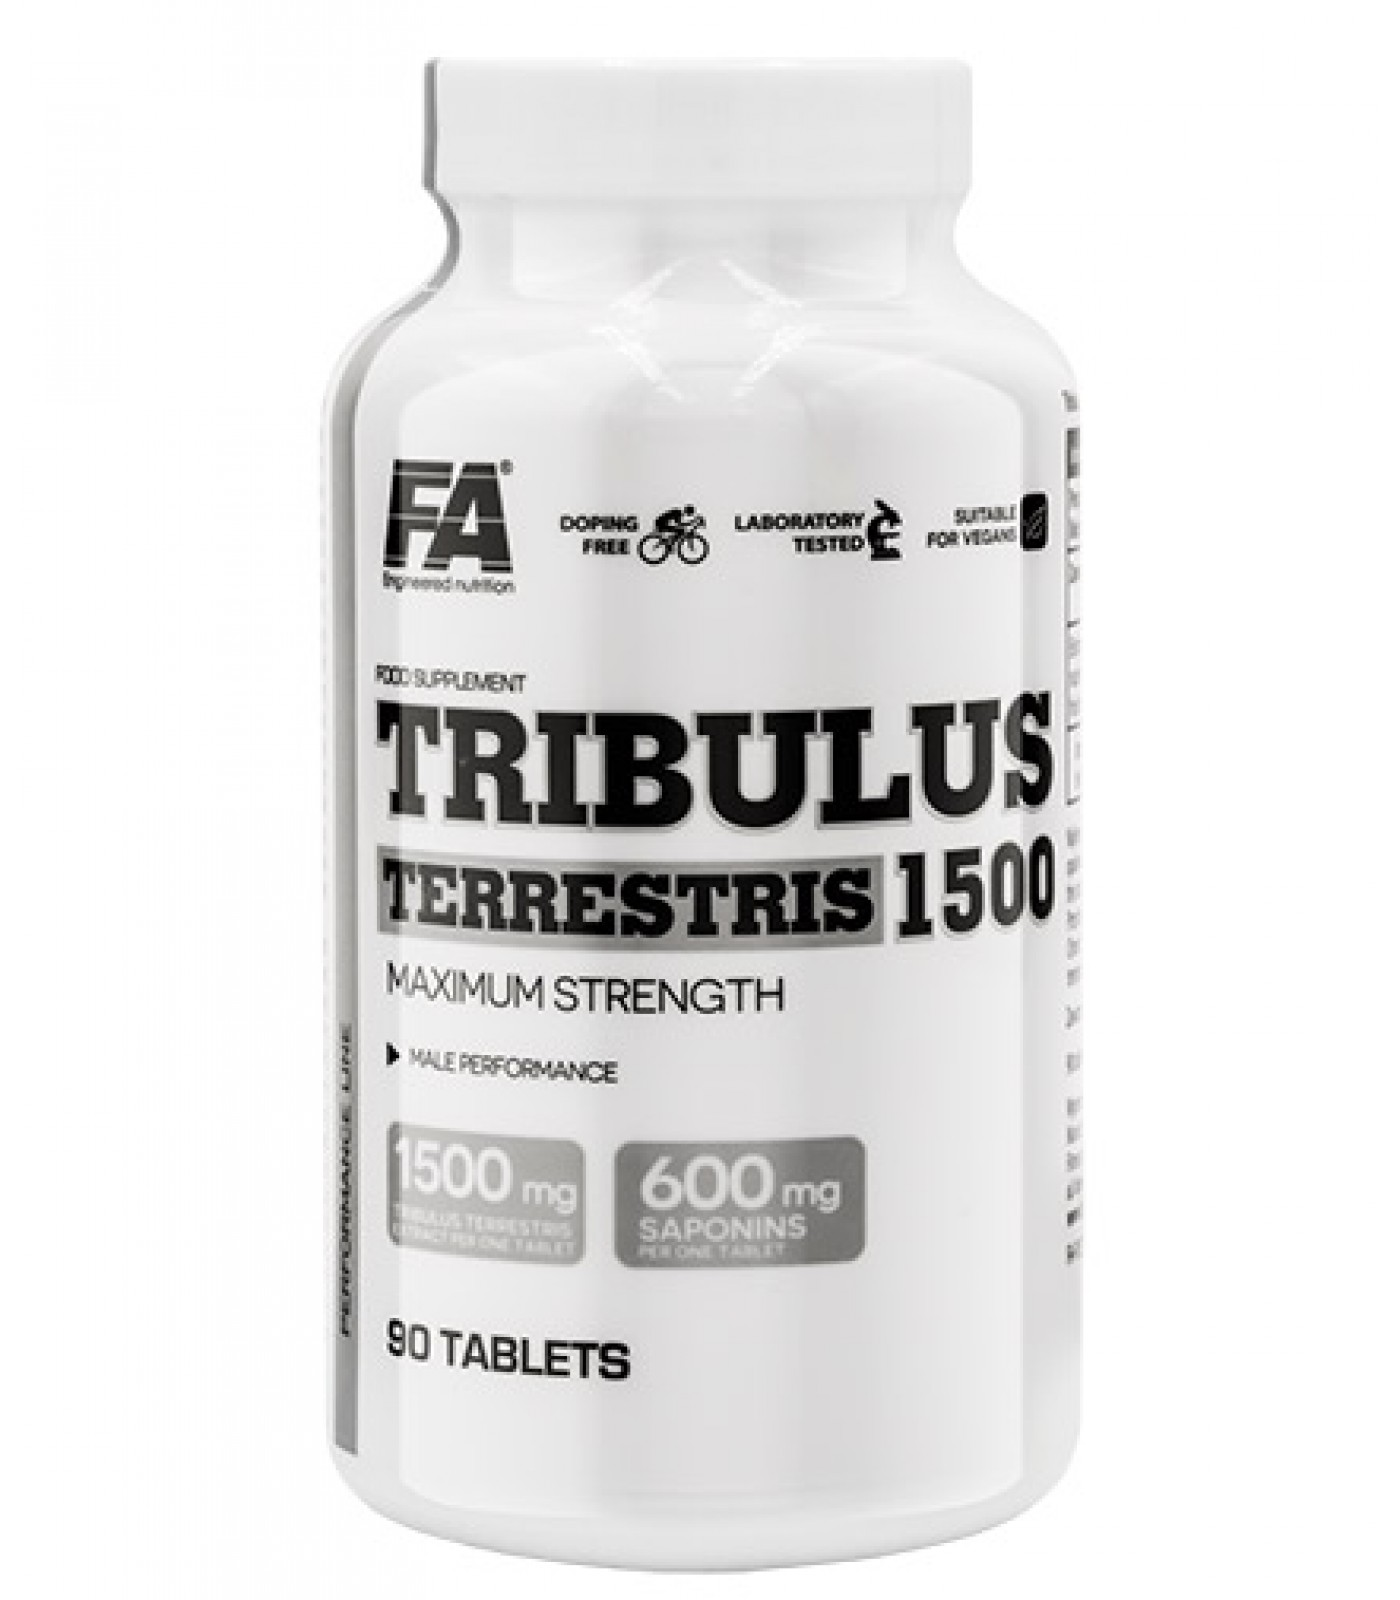 FA Nutrition - Tribulus Terrestris 1500 / Maximum Strength / 90 tab